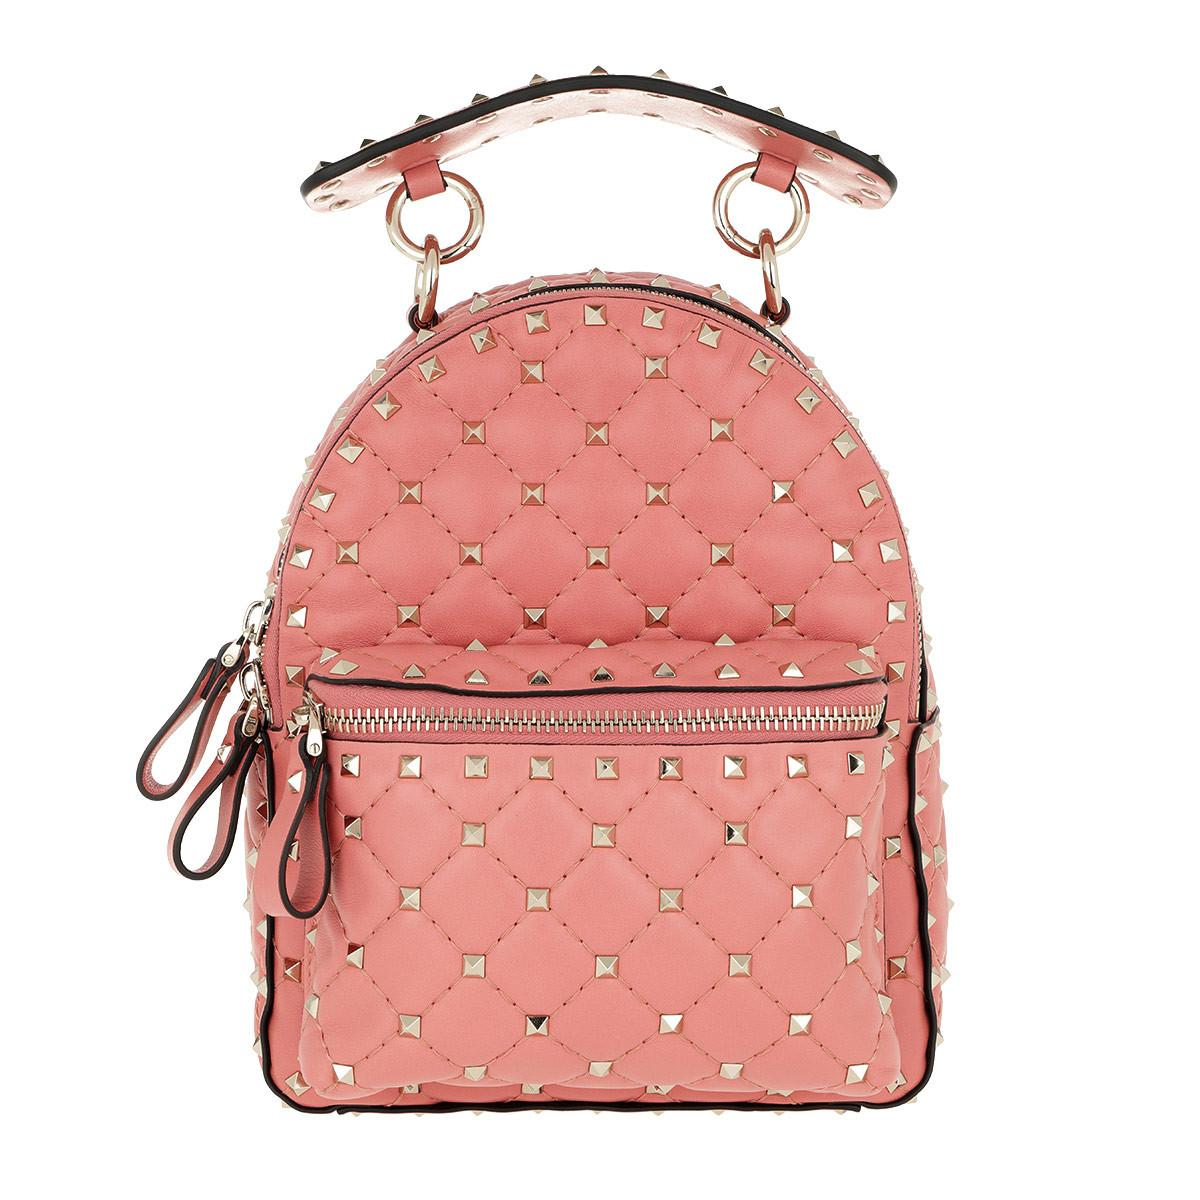 0b6665b30de73 valentino-rose-Rockstud-Spike-Backpack-Leather-Tropical-Sunrise.jpeg